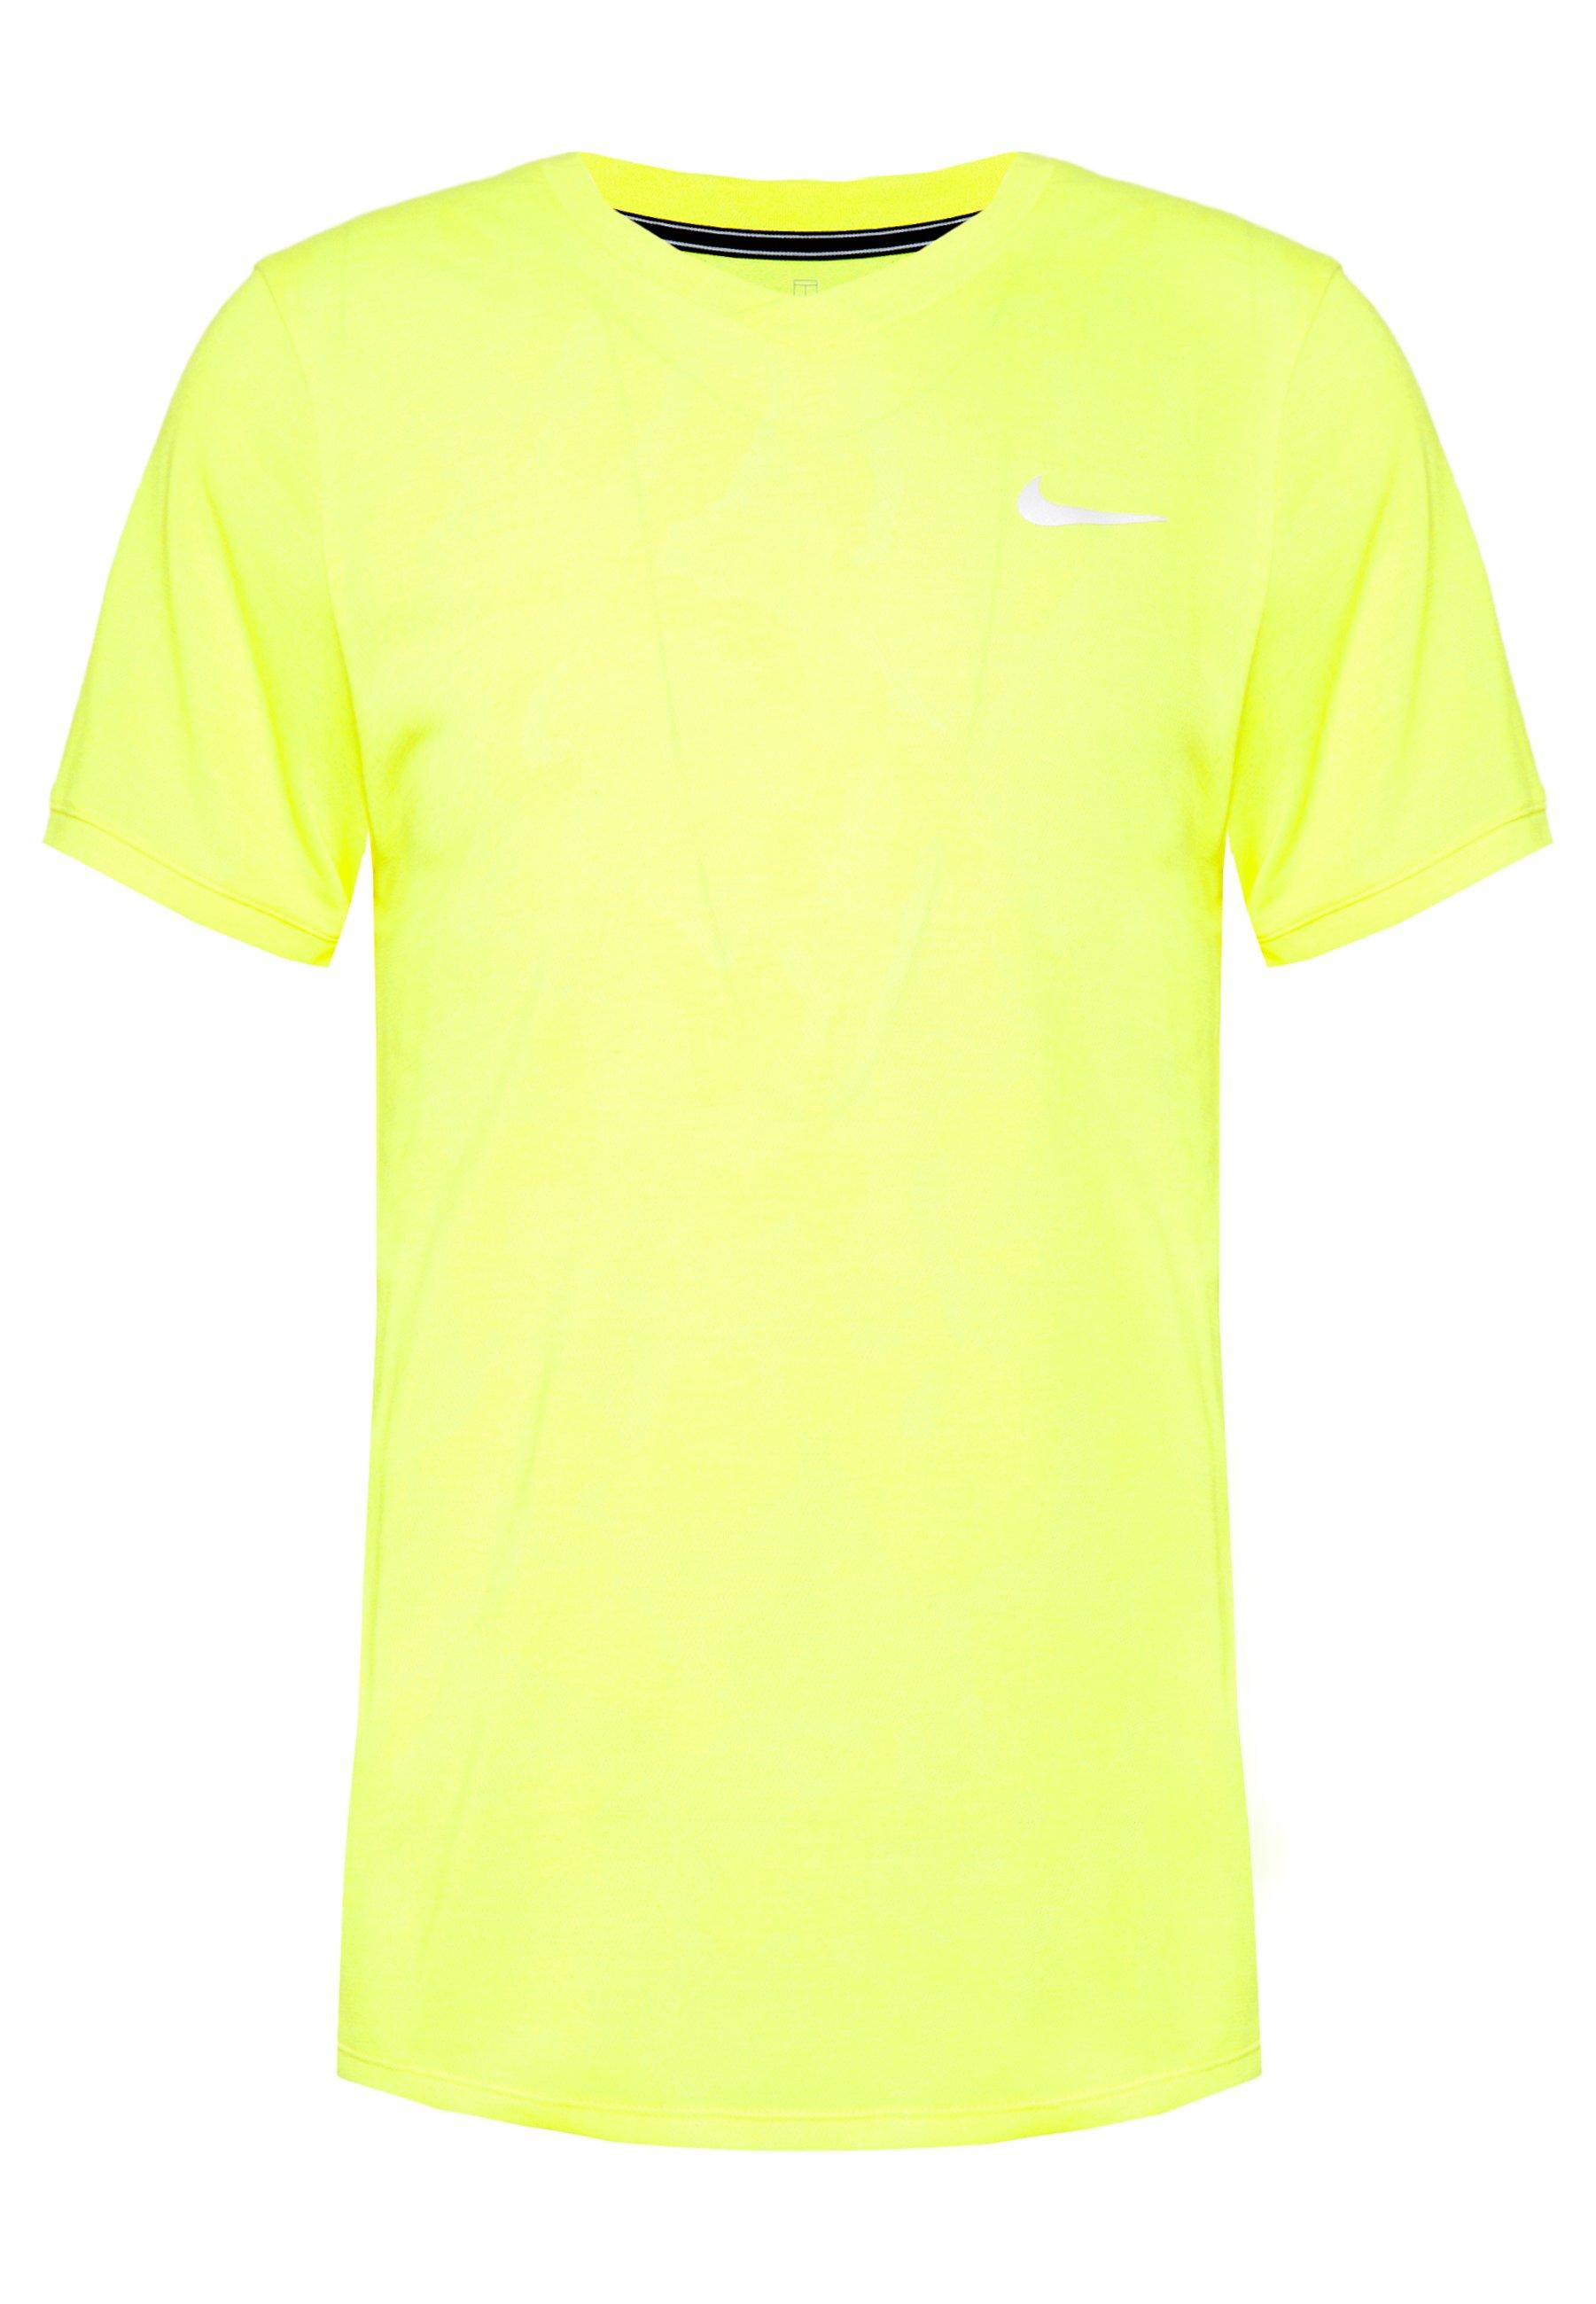 Nike Performance DRY T shirt basique opti yellowwhite